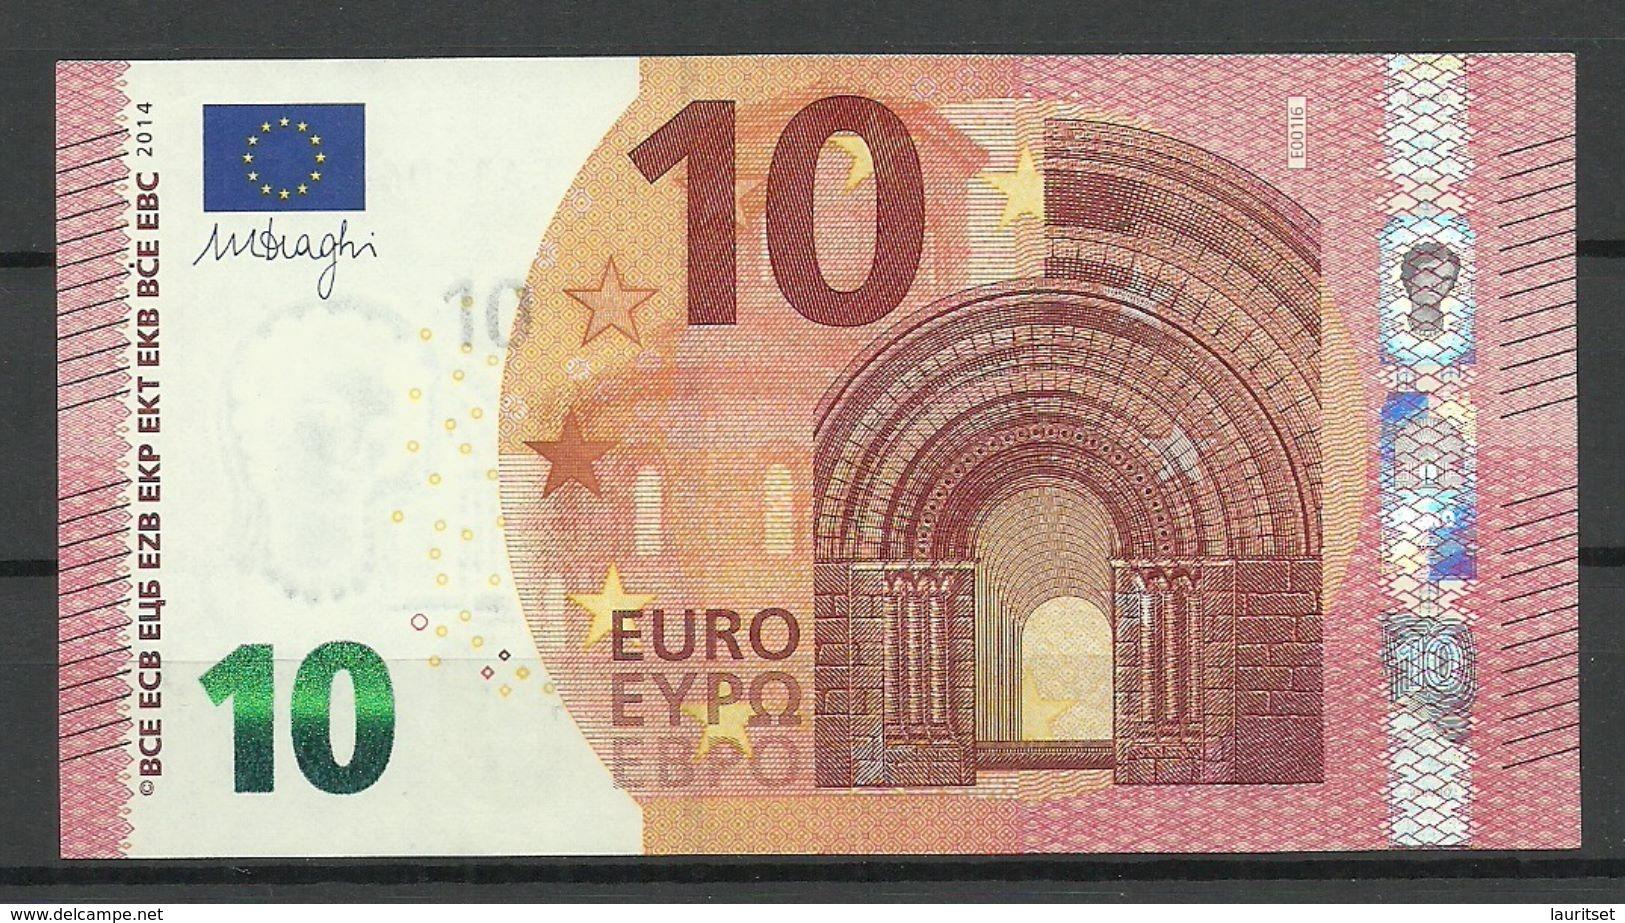 SLOVAKIA 10 EUR 2014 E-Serie Banknote - EURO